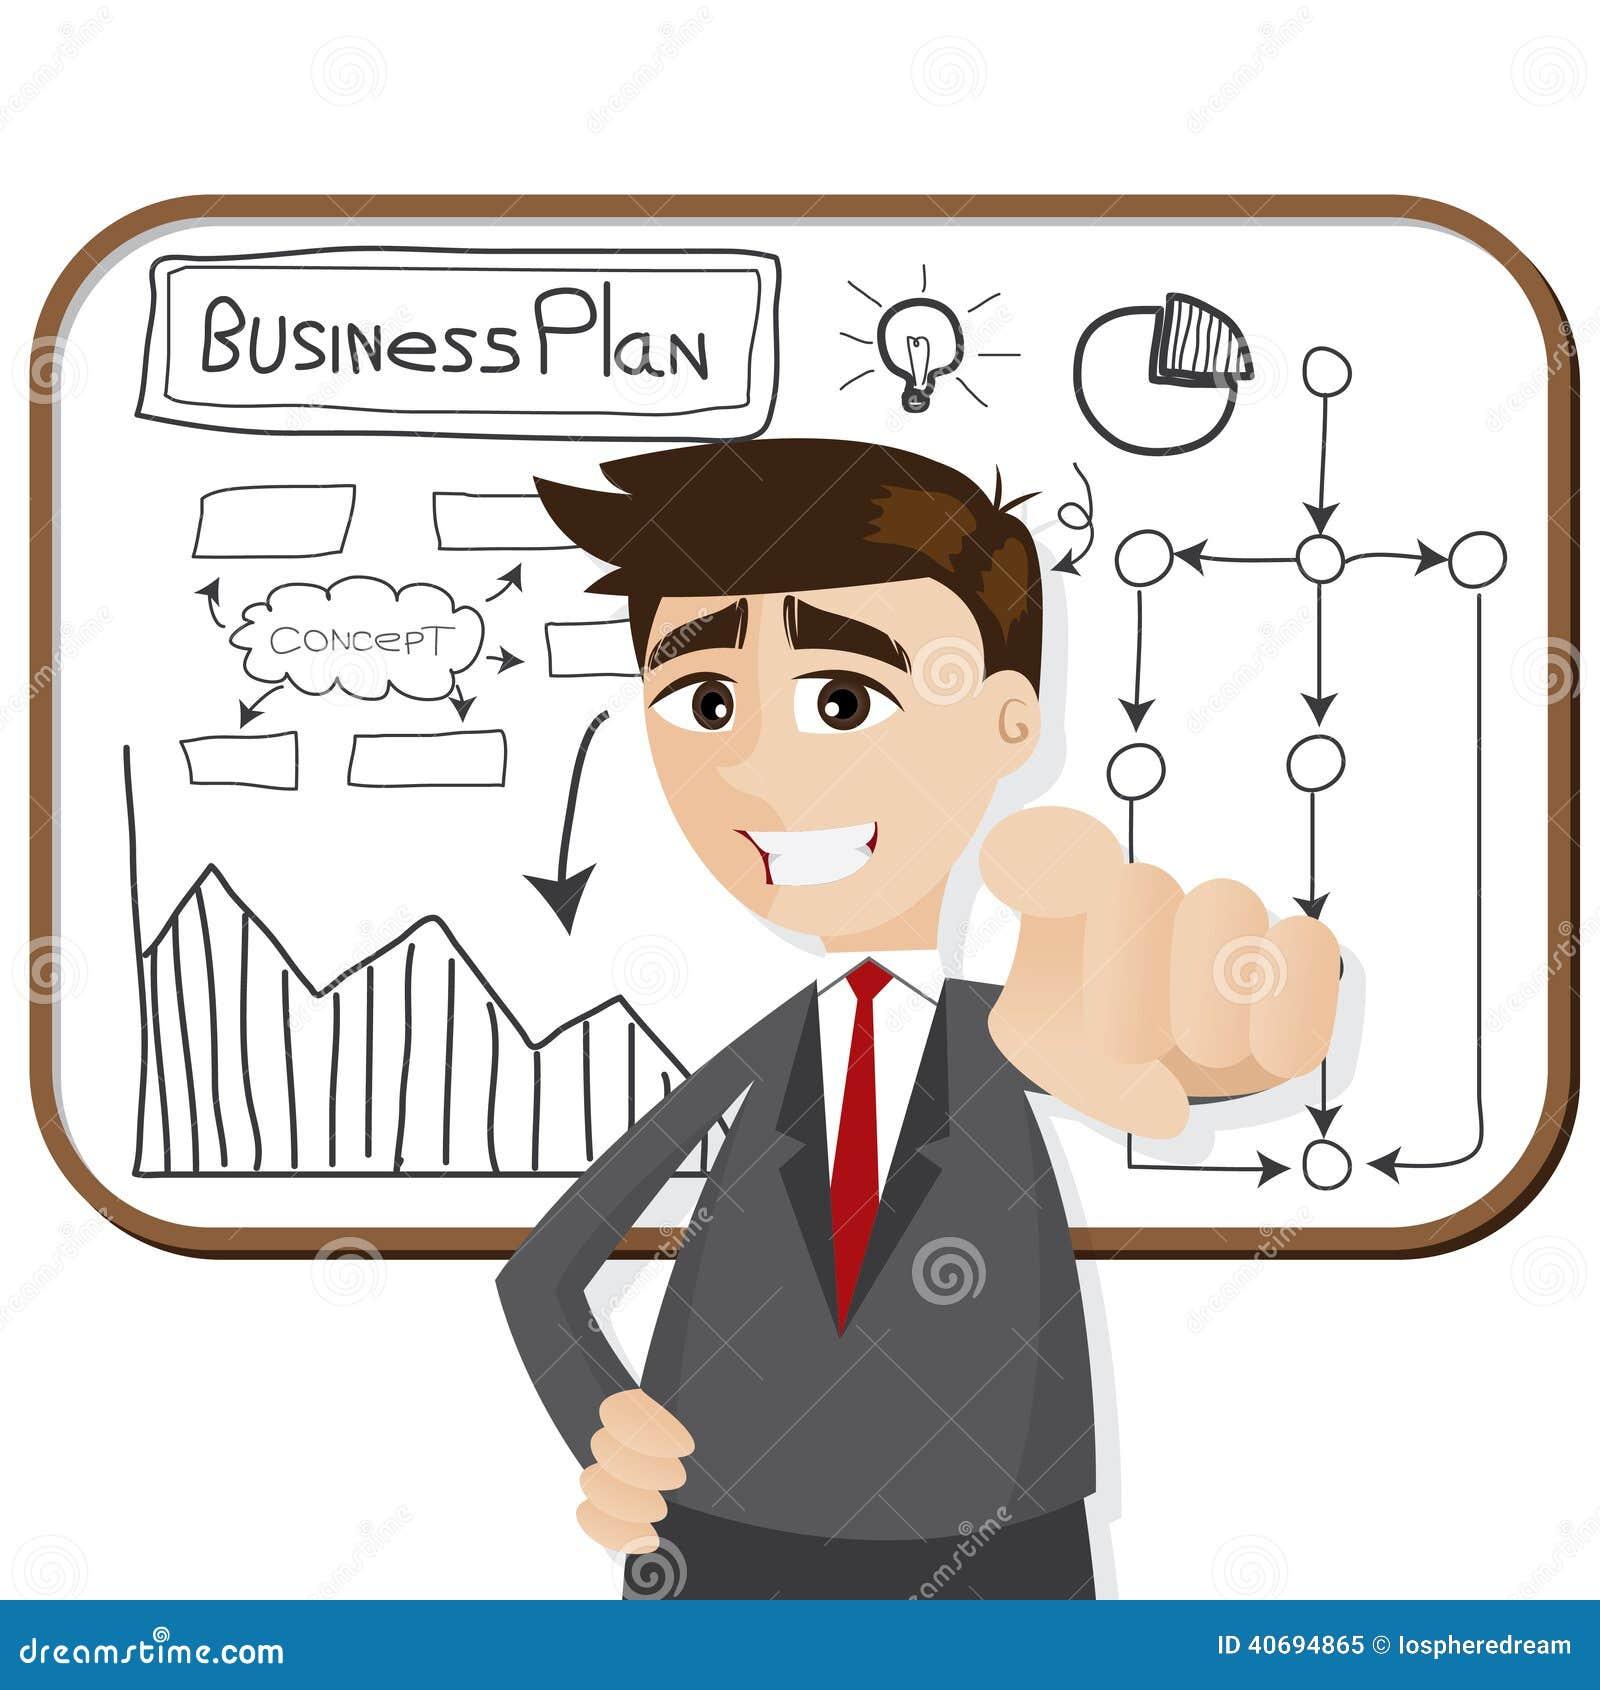 Cartoons business plan – Sales Territory Business Plan